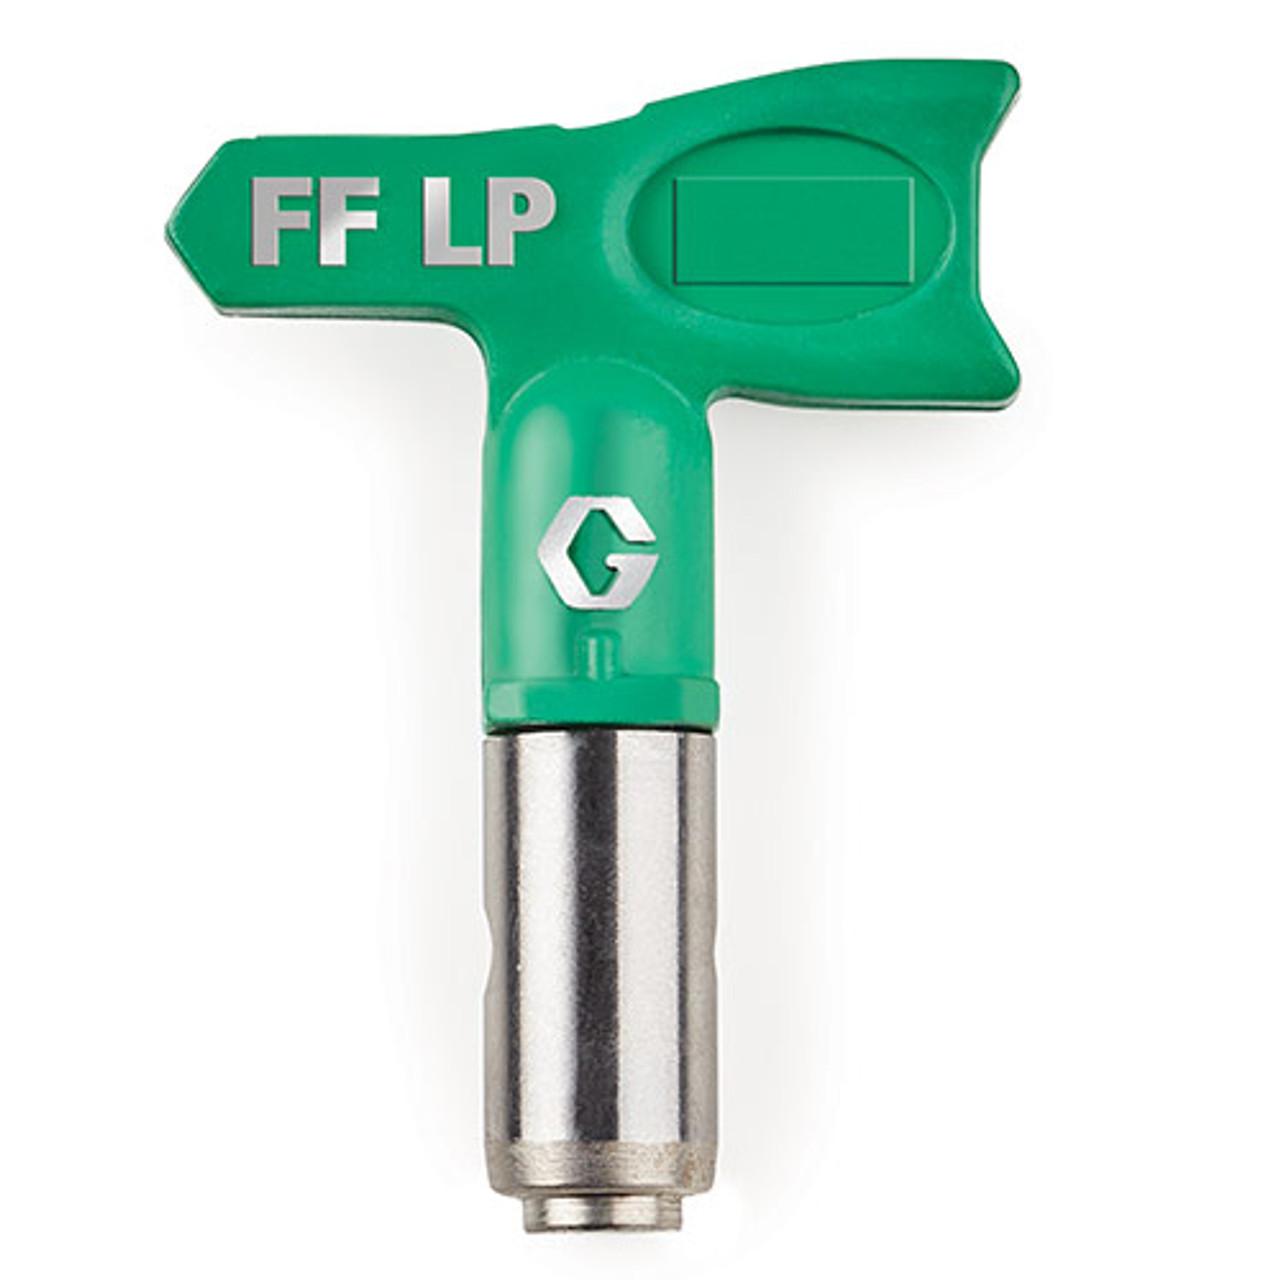 Graco RAC X FFLP Fine Finish Low Pressure Airless Paint Spray Tip